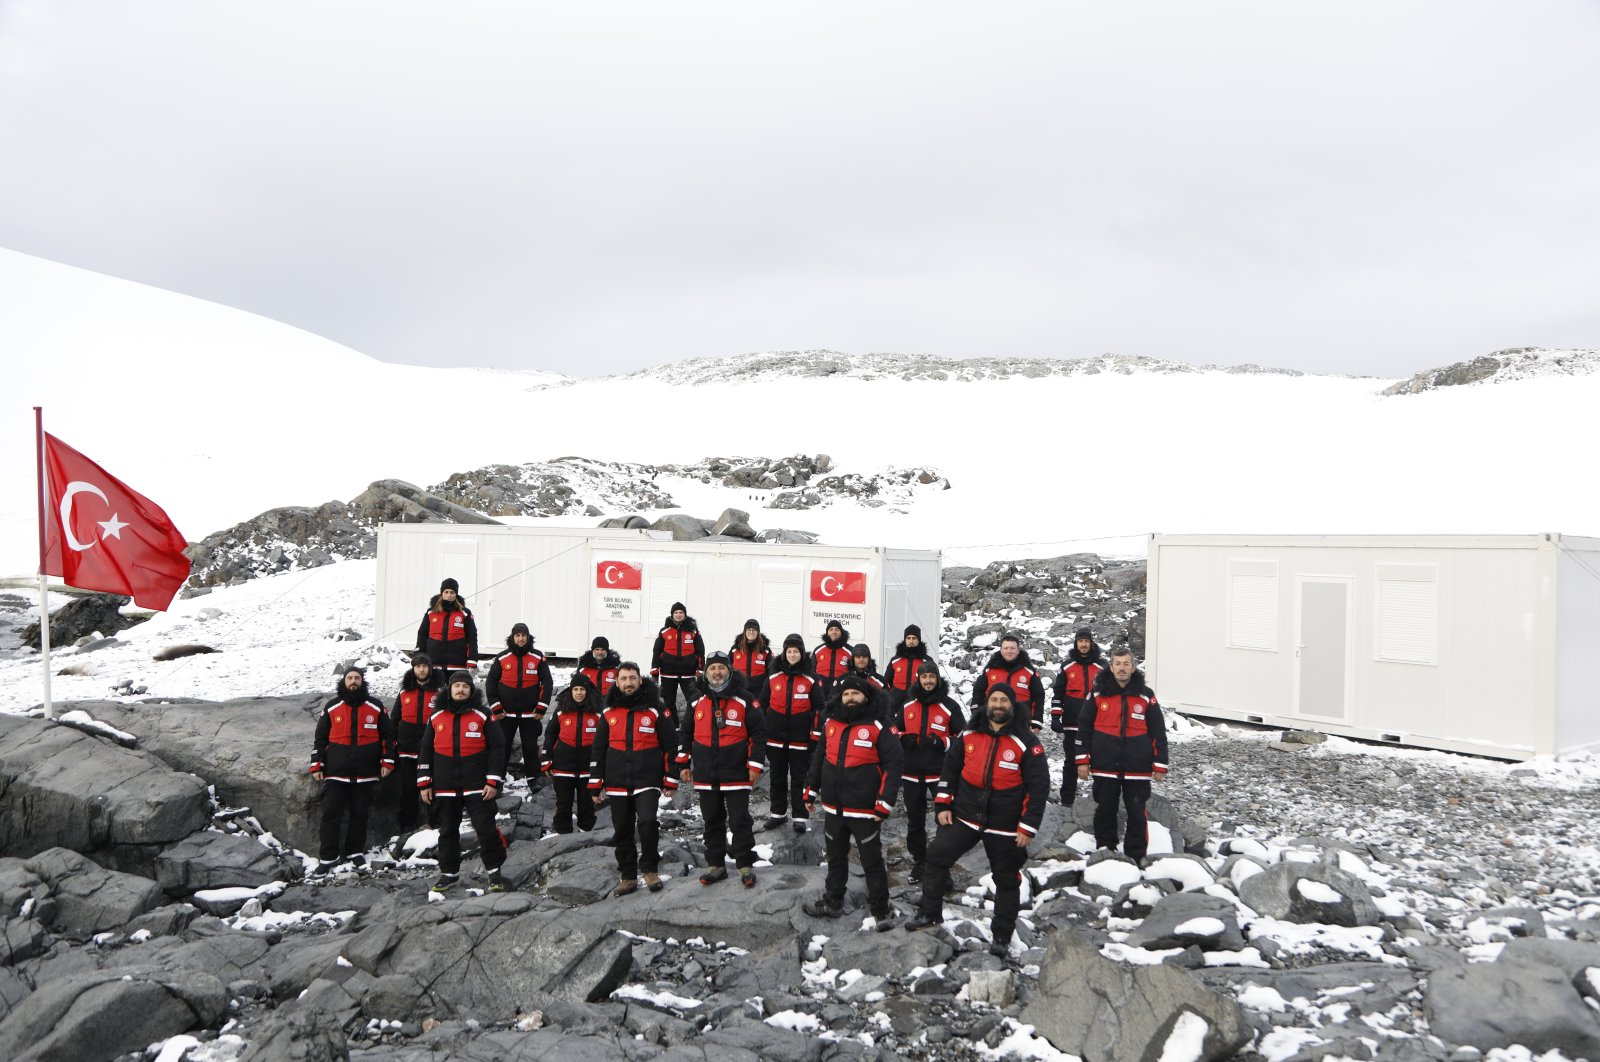 The Turkish team poses outside Turkey's Antarctic base. (Photo by Hayrettin Bektaş)